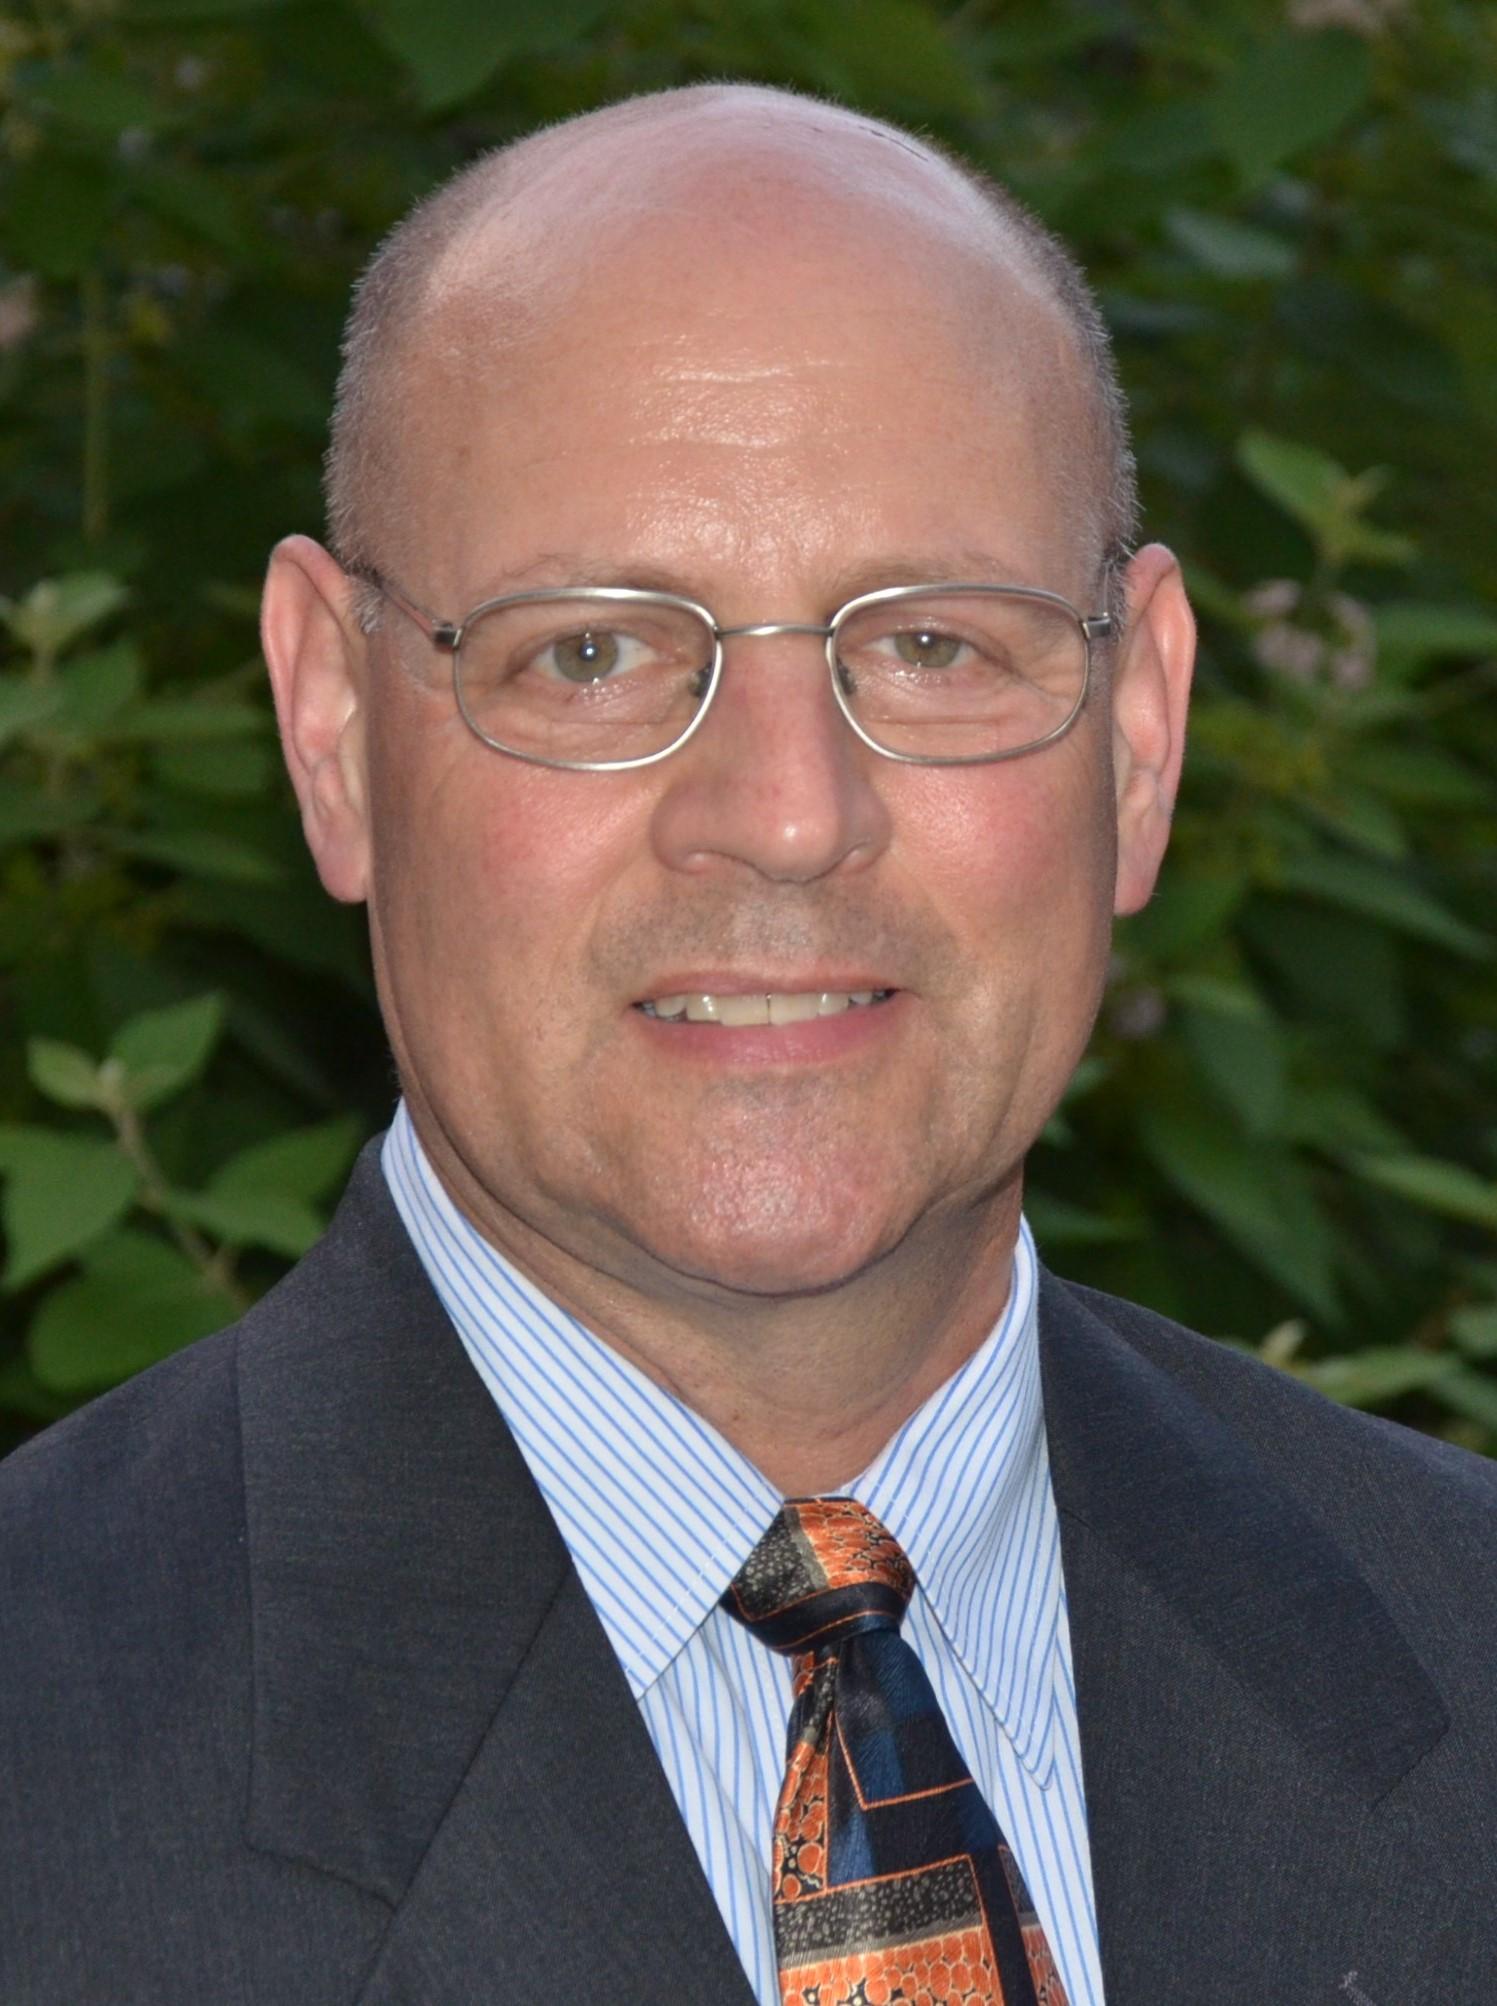 Douglas L. Risk